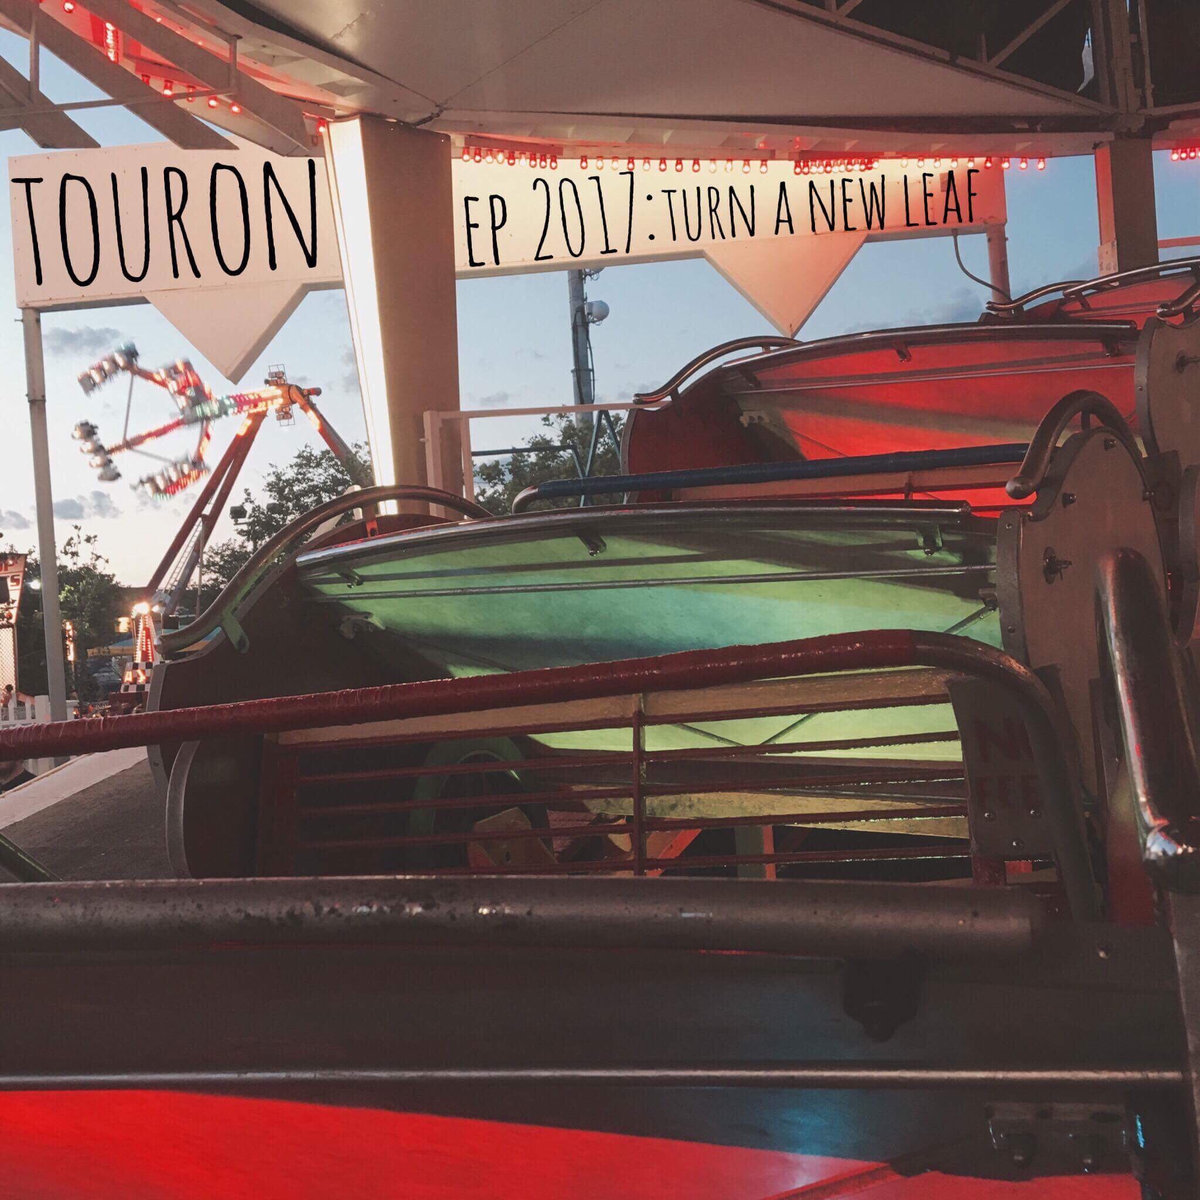 Touron - Turn a New Leaf